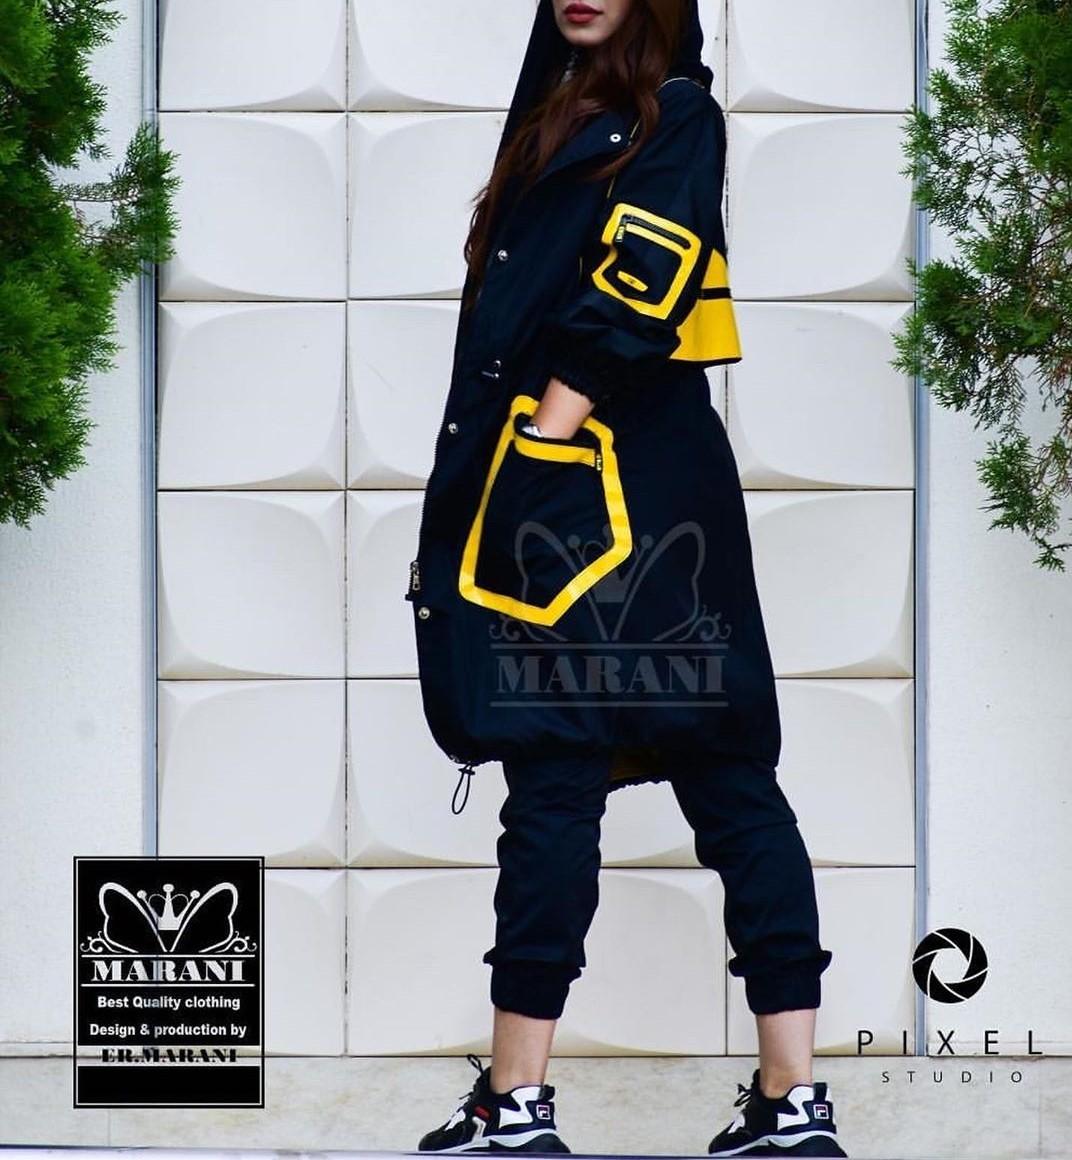 مدل مانتو اسپرت پاییزه دخترانه